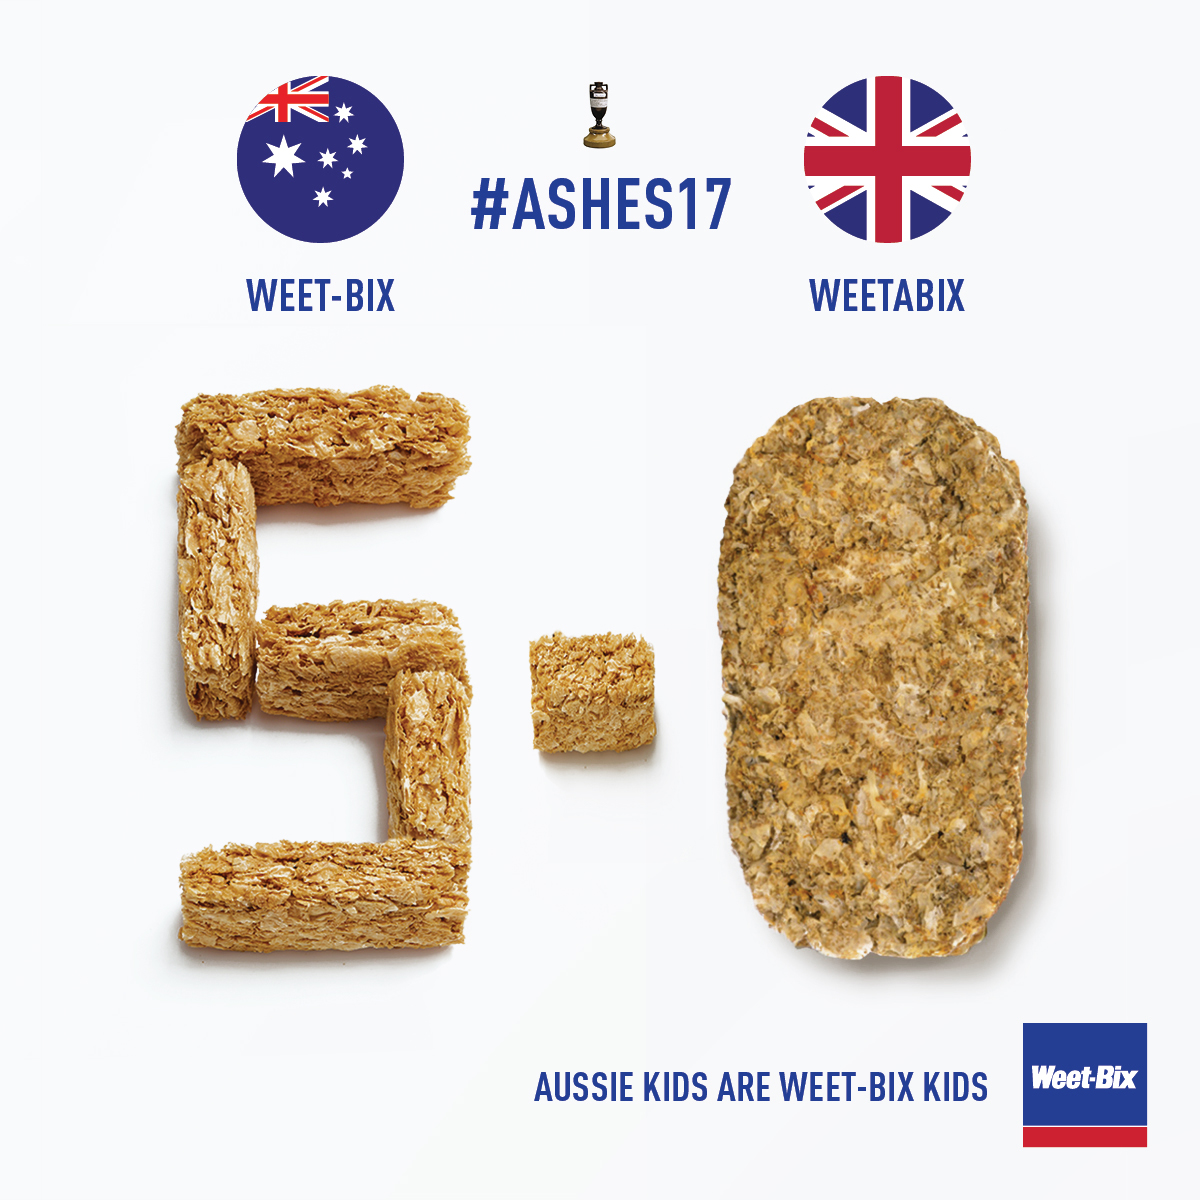 TST0044 - Cricket 2017 Ashes Weetabix Social Post - 5-0 - FA.jpg